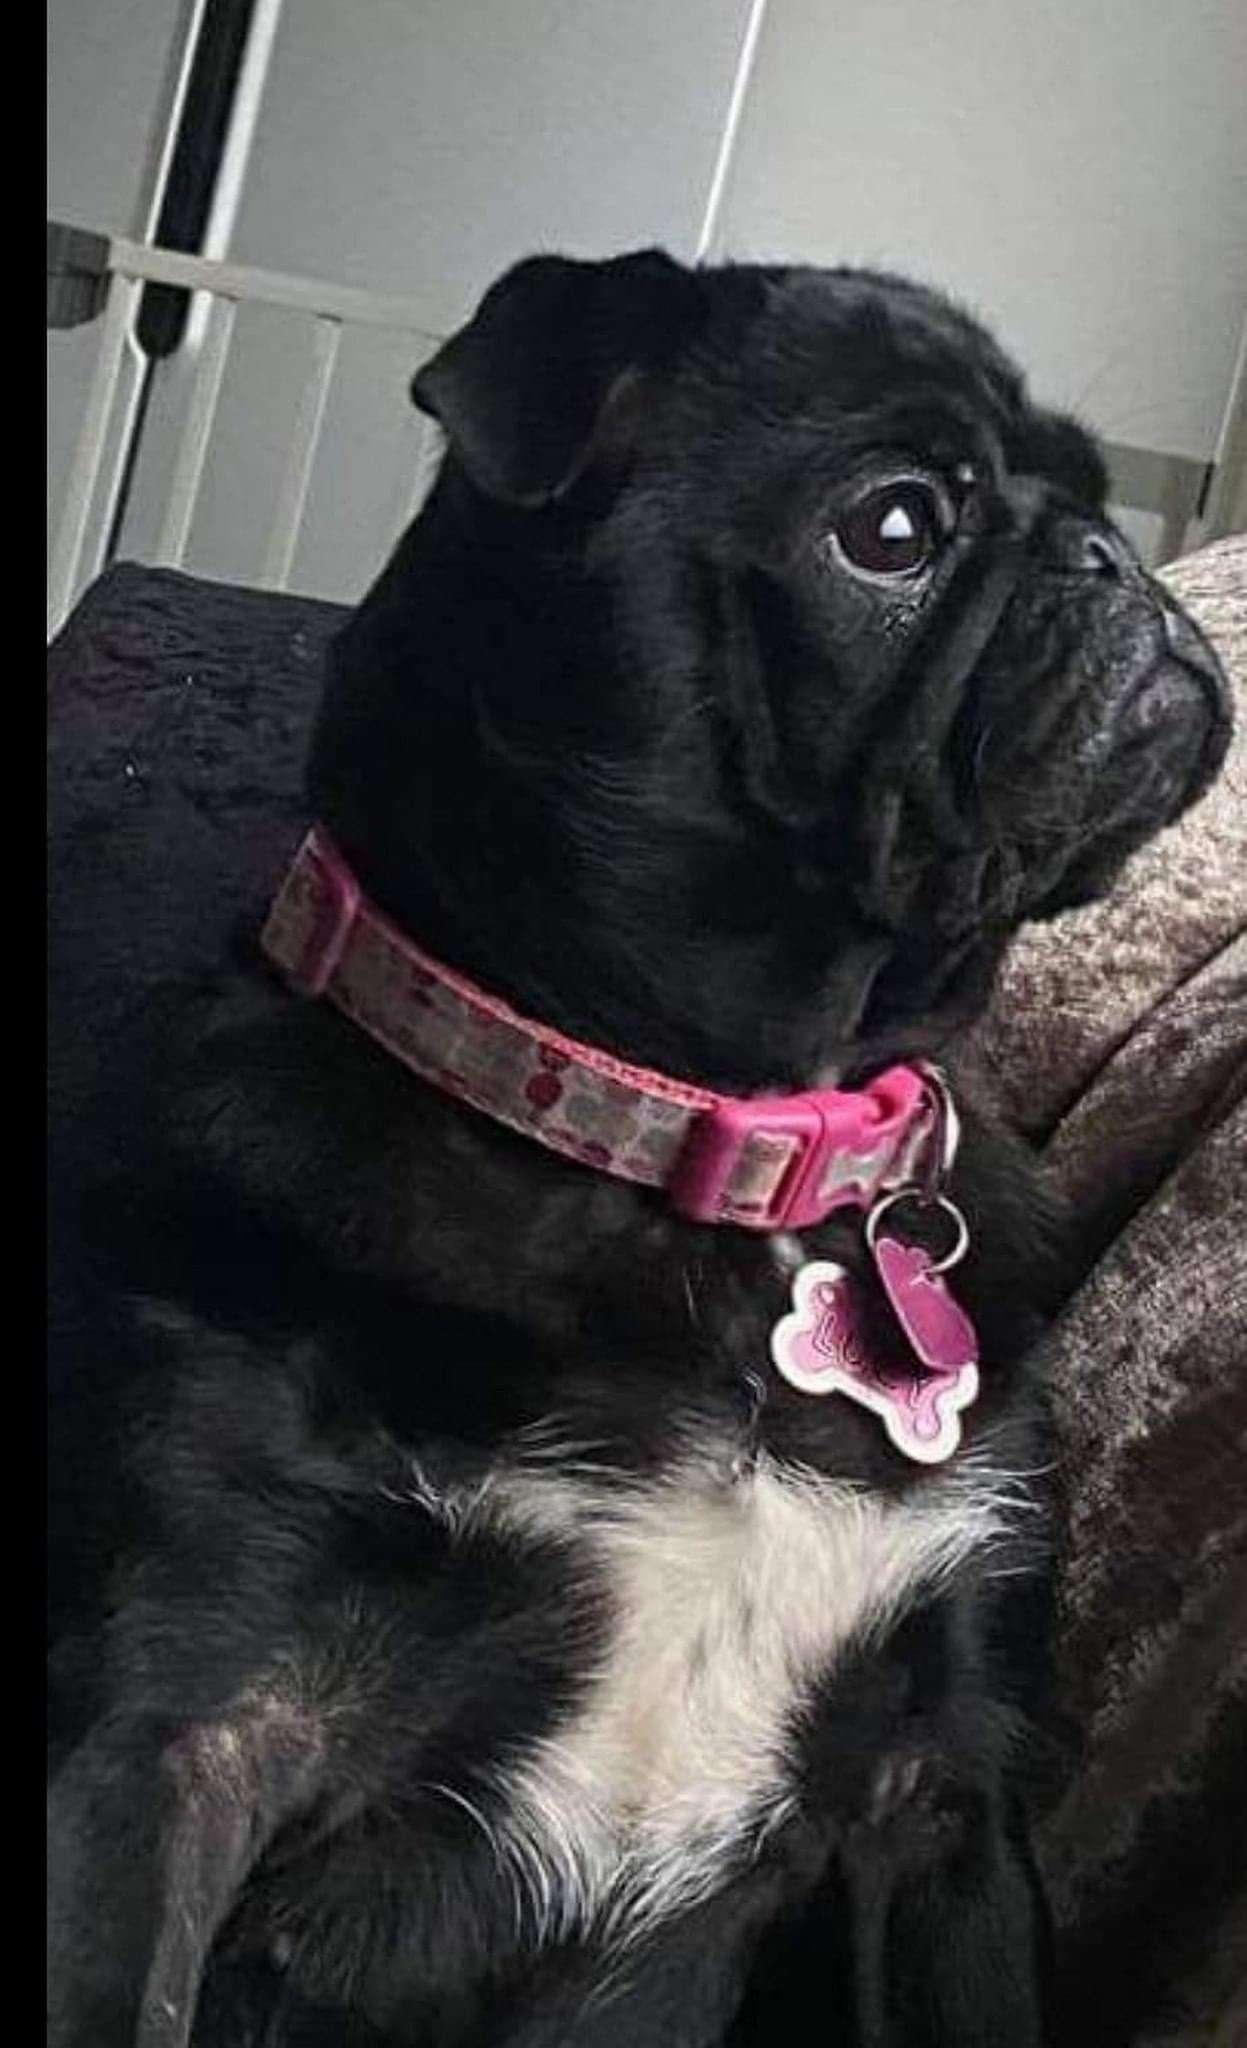 Kind stranger donates £1,000 to search for disabled girl's beloved dog in Rotherham #PetTheftReform